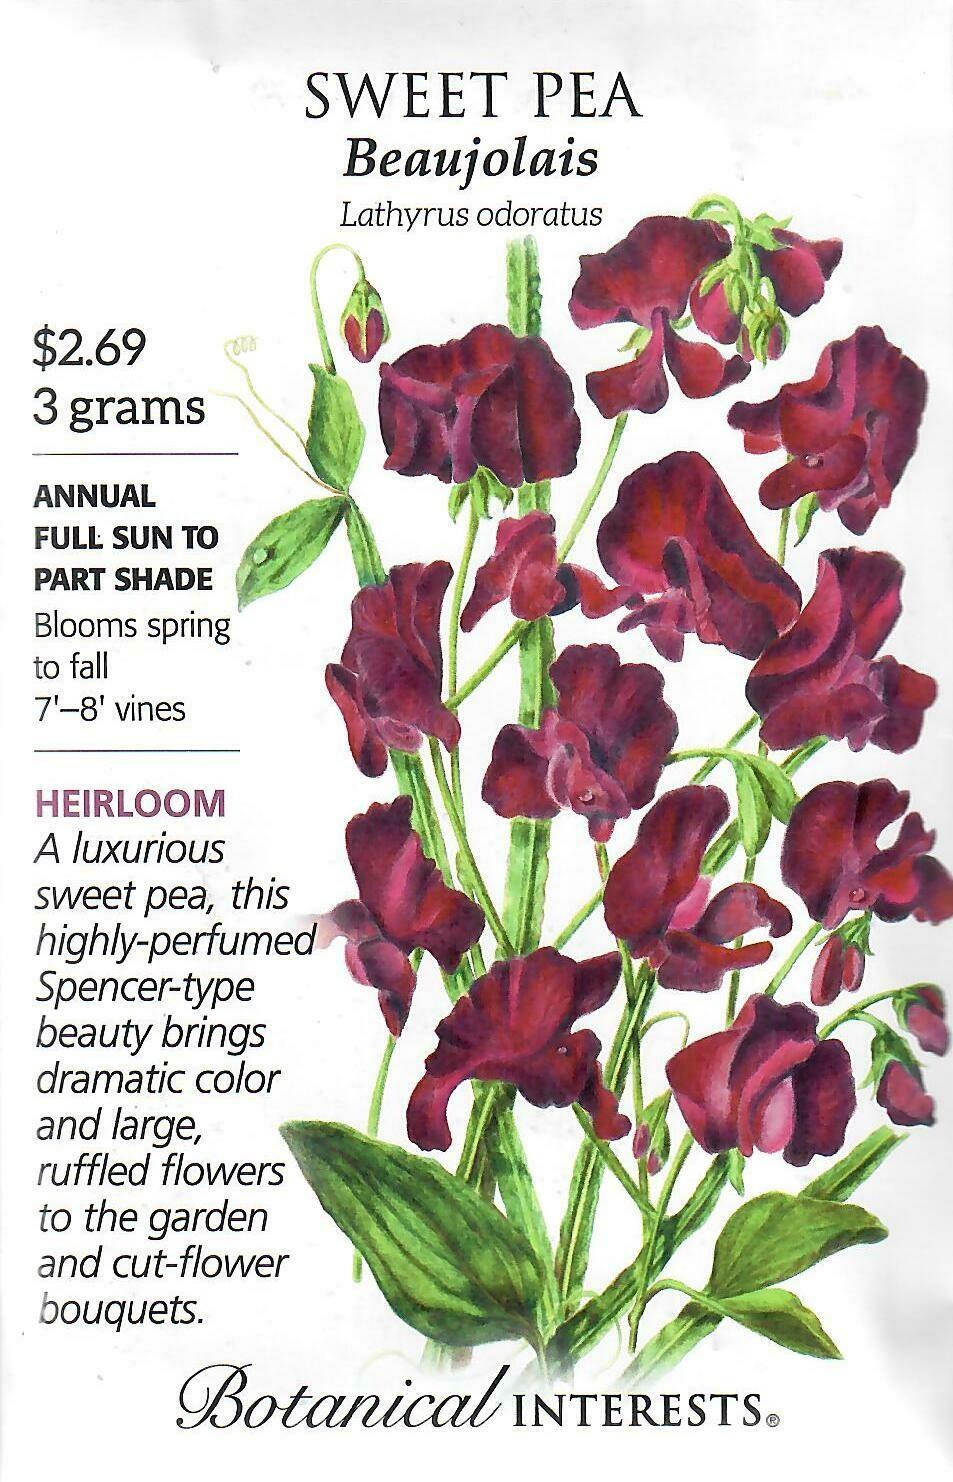 Sweet Pea Beaujolais Botanical Interests